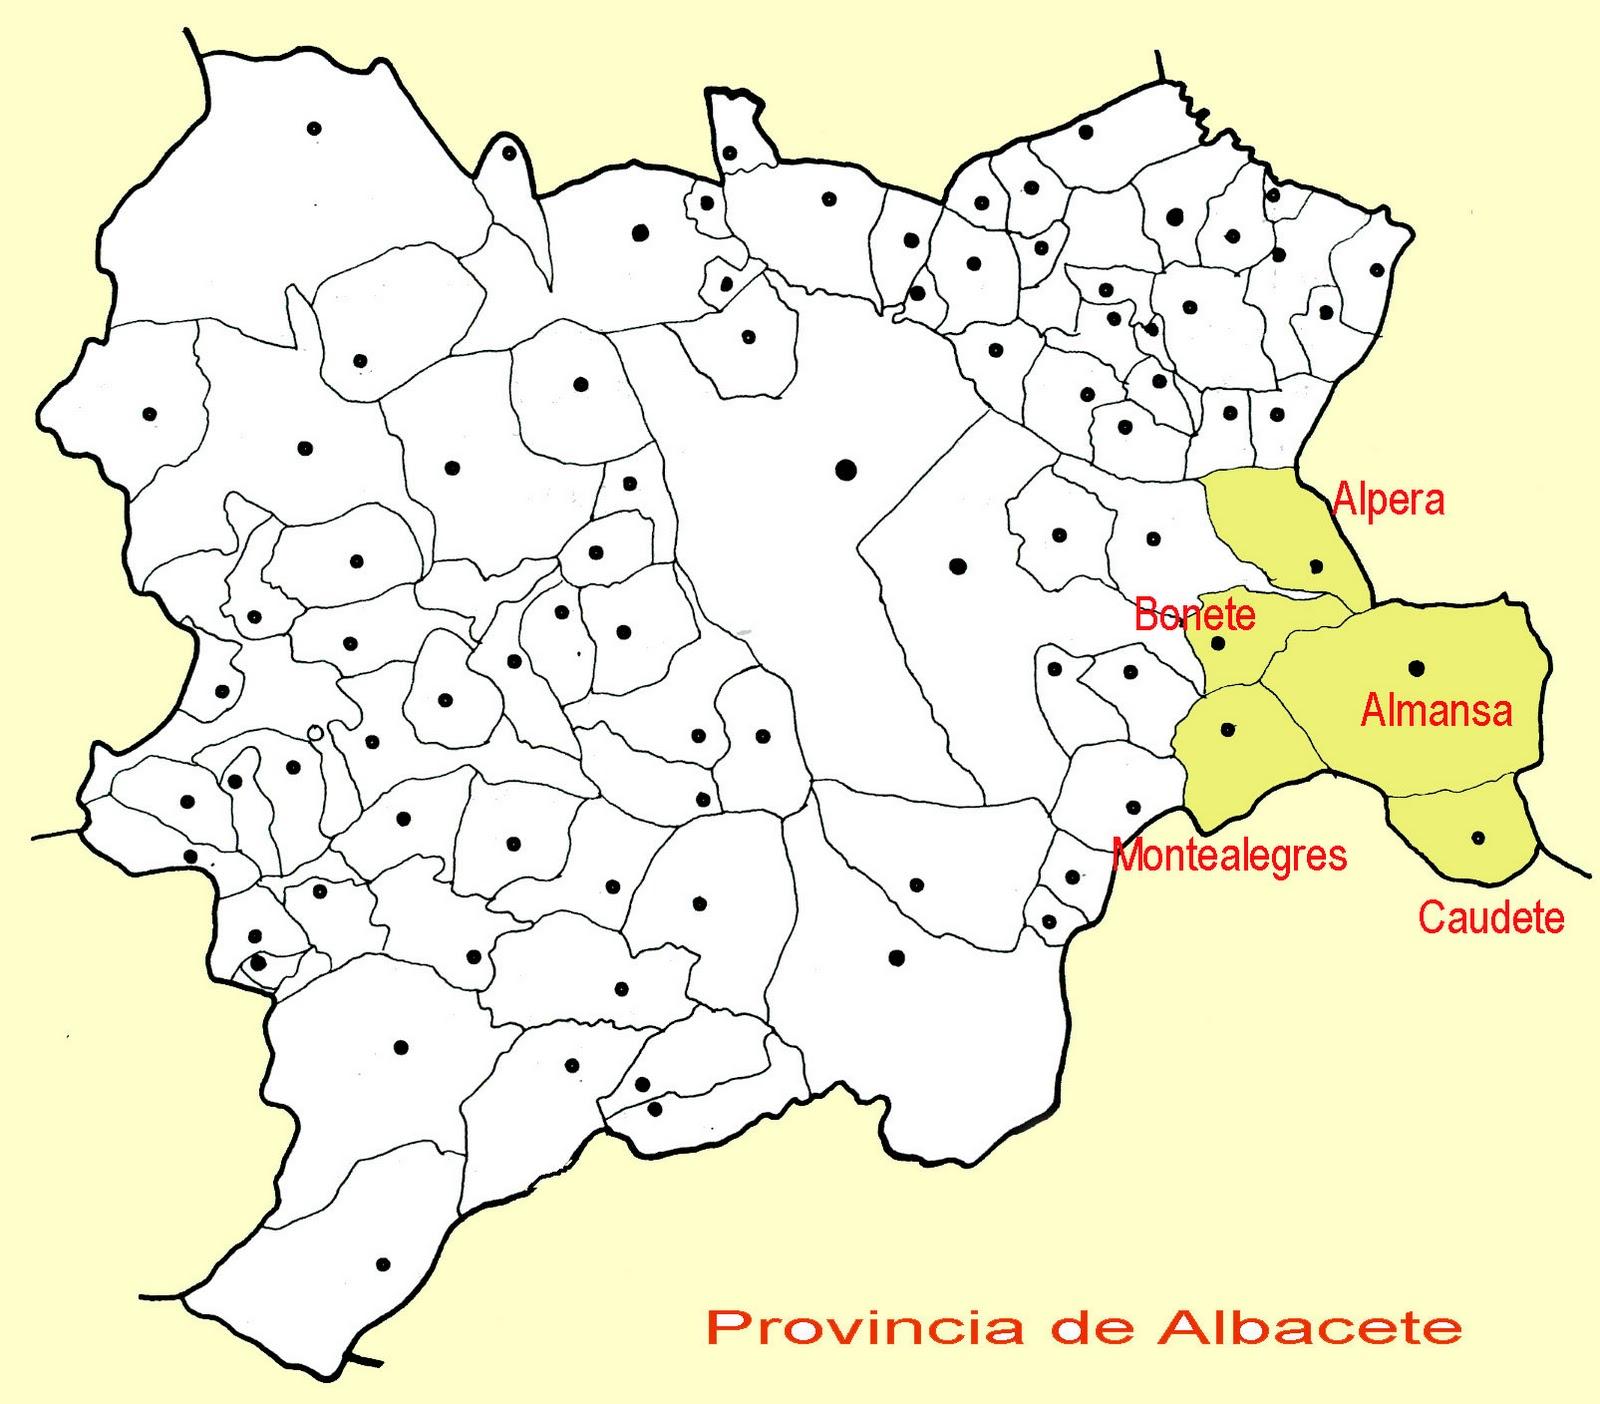 Albacete geograf a general tema 12 el altiplano de almansa for Provincia sudafricana con durban